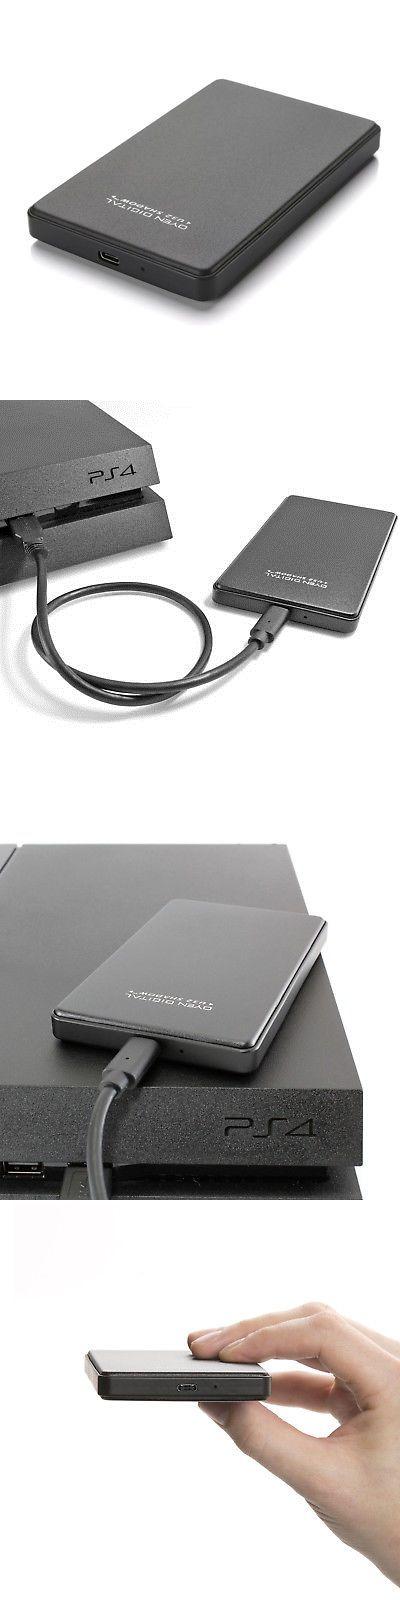 Hard Drives 171820: U32 Shadow 2Tb Usb 3 1 External Hard